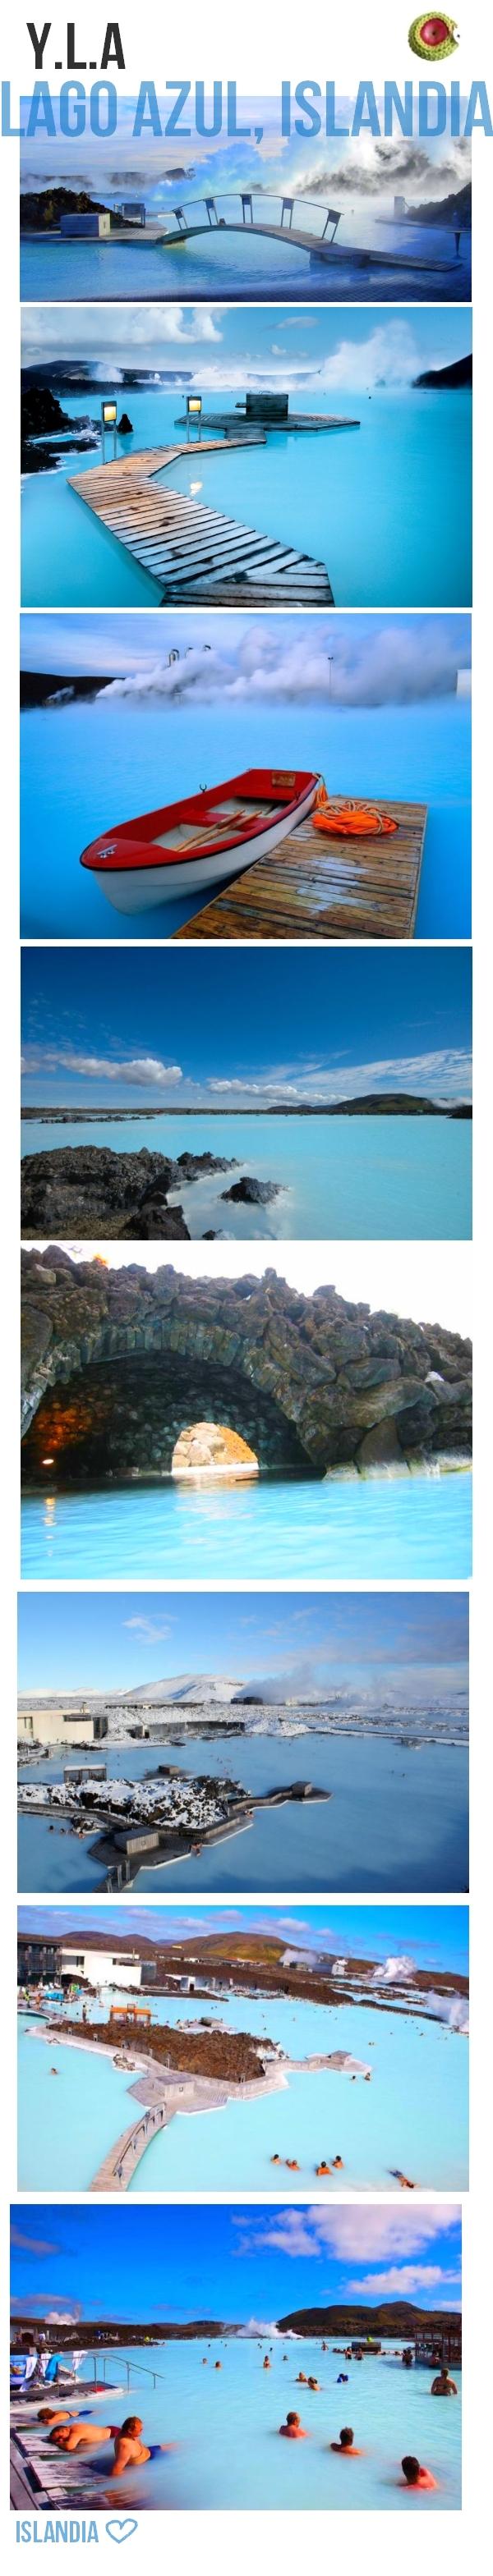 lago_azul